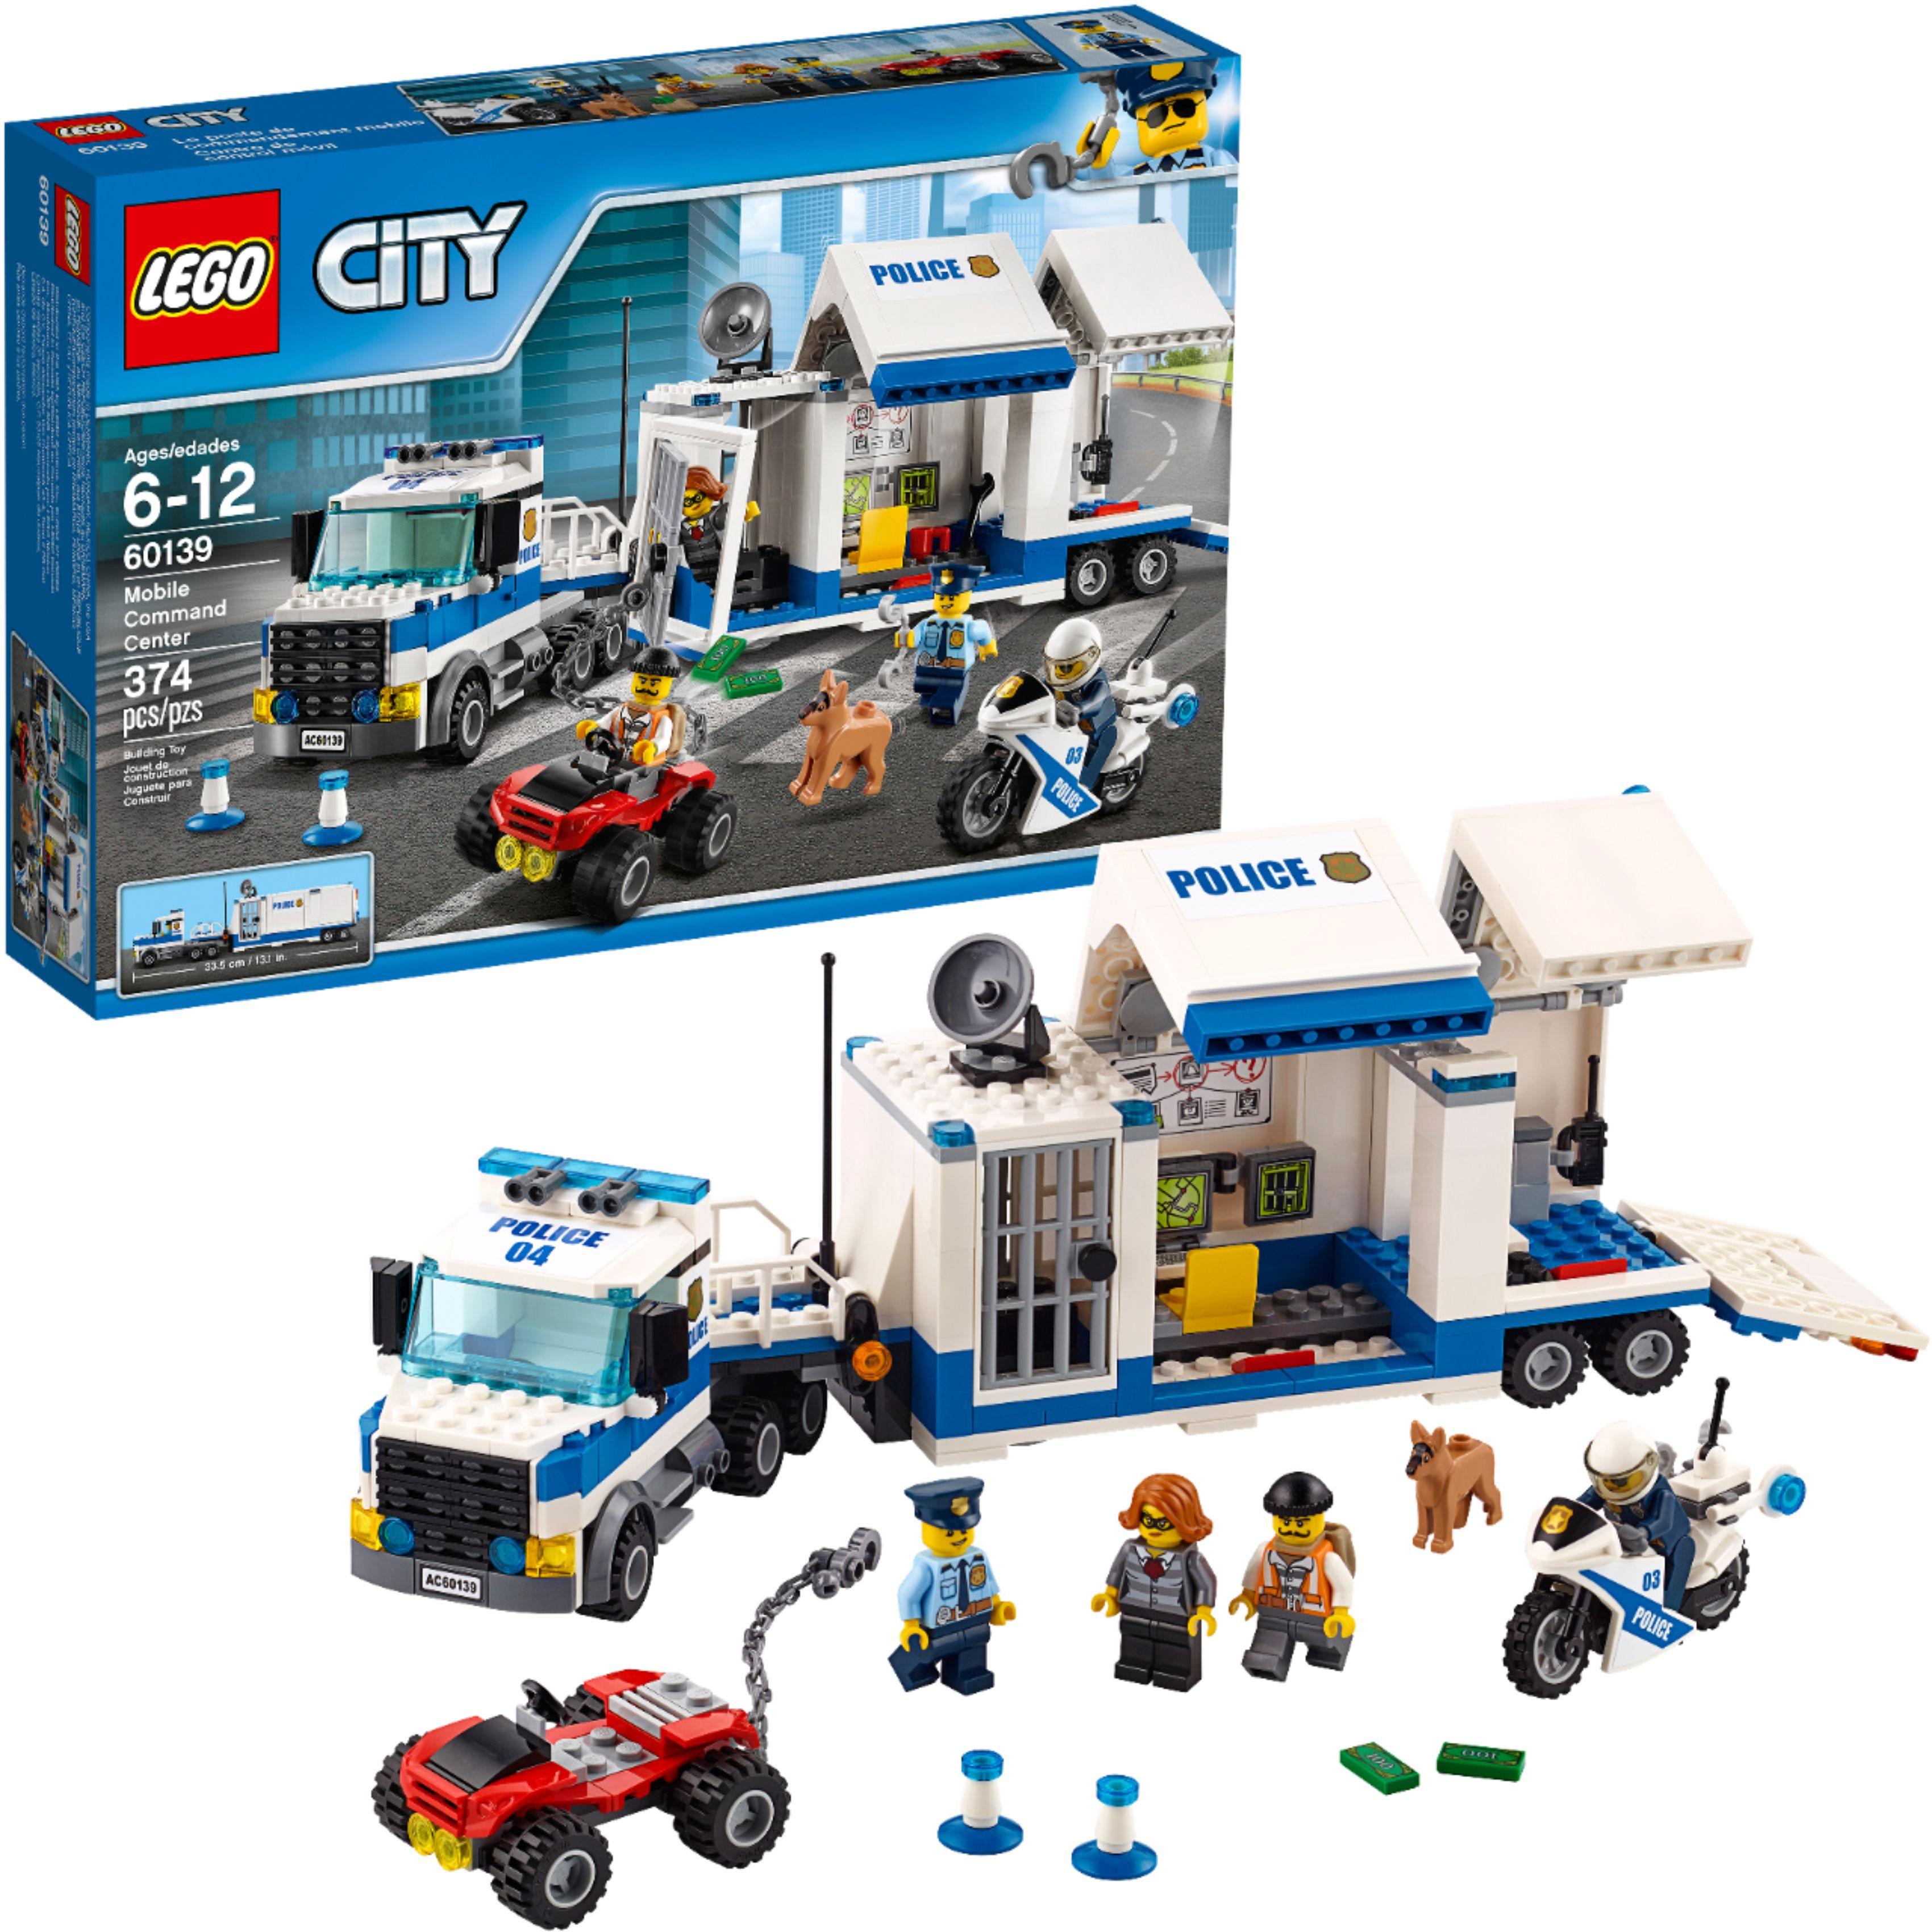 LEGO - City Mobile Command Center 60139 - Multi $28.99 + ship